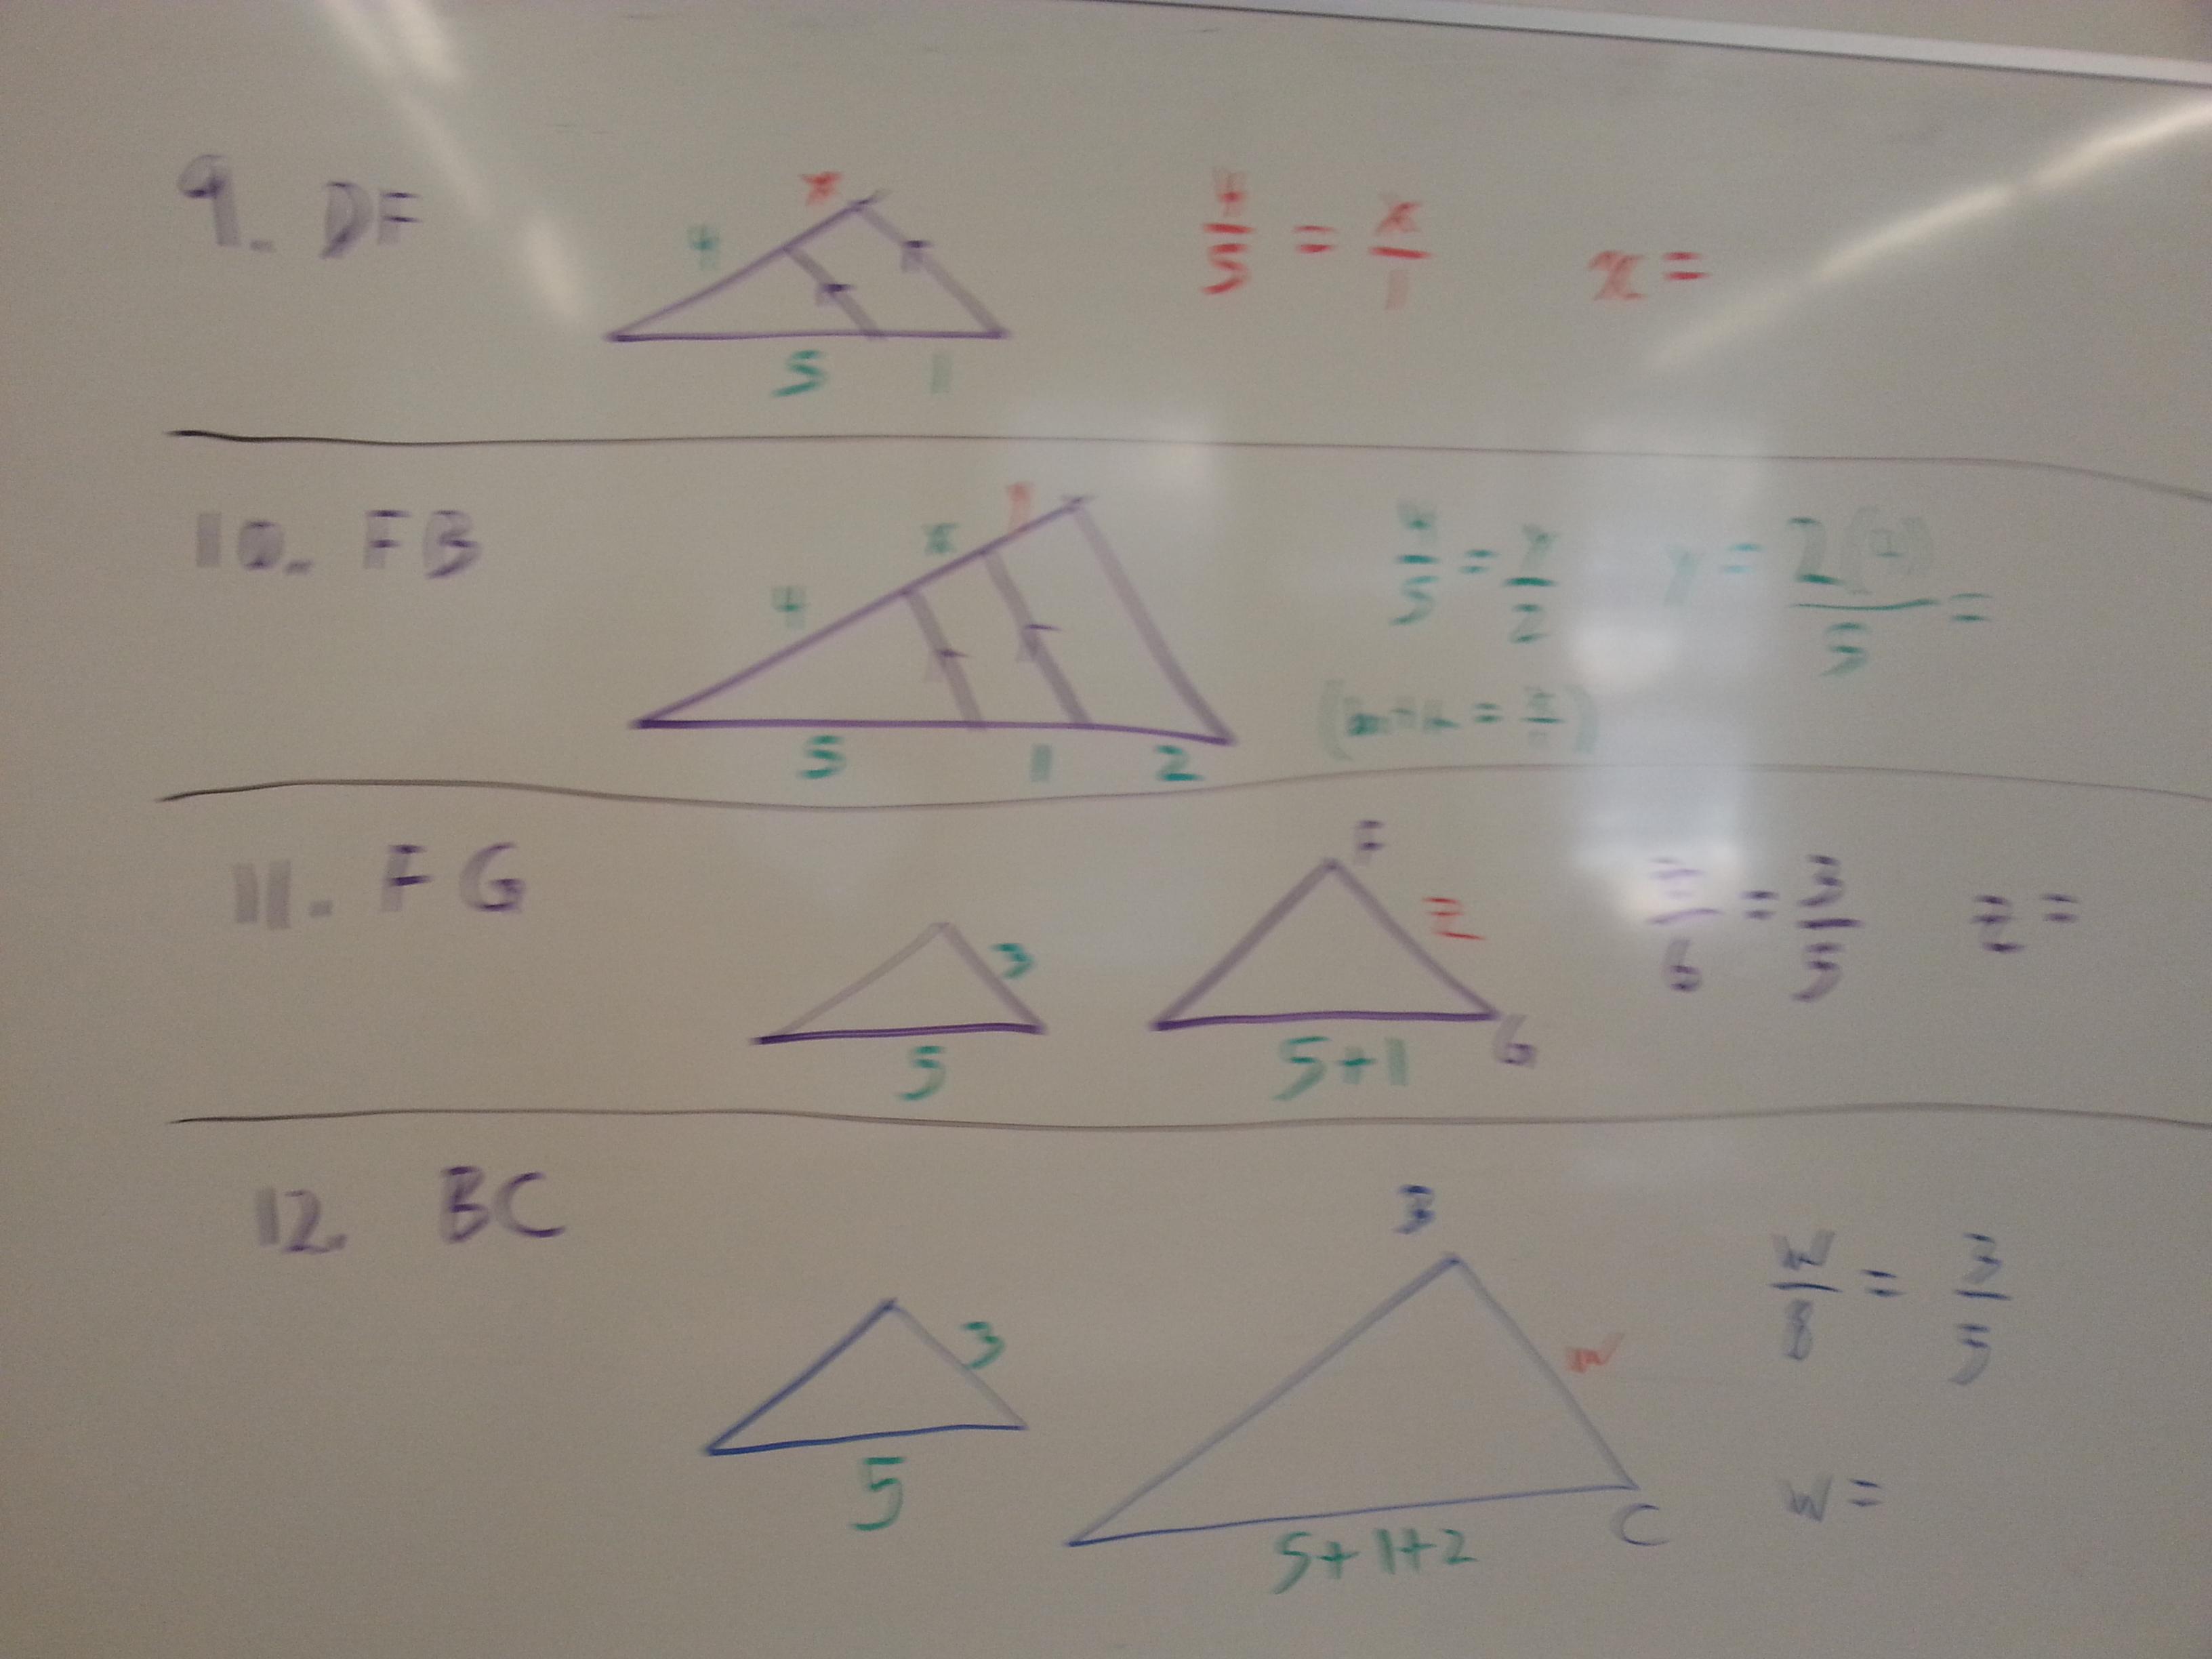 Geometry Simil Rity W Ksheet Free W Ksheets Libr Ry Downlo D